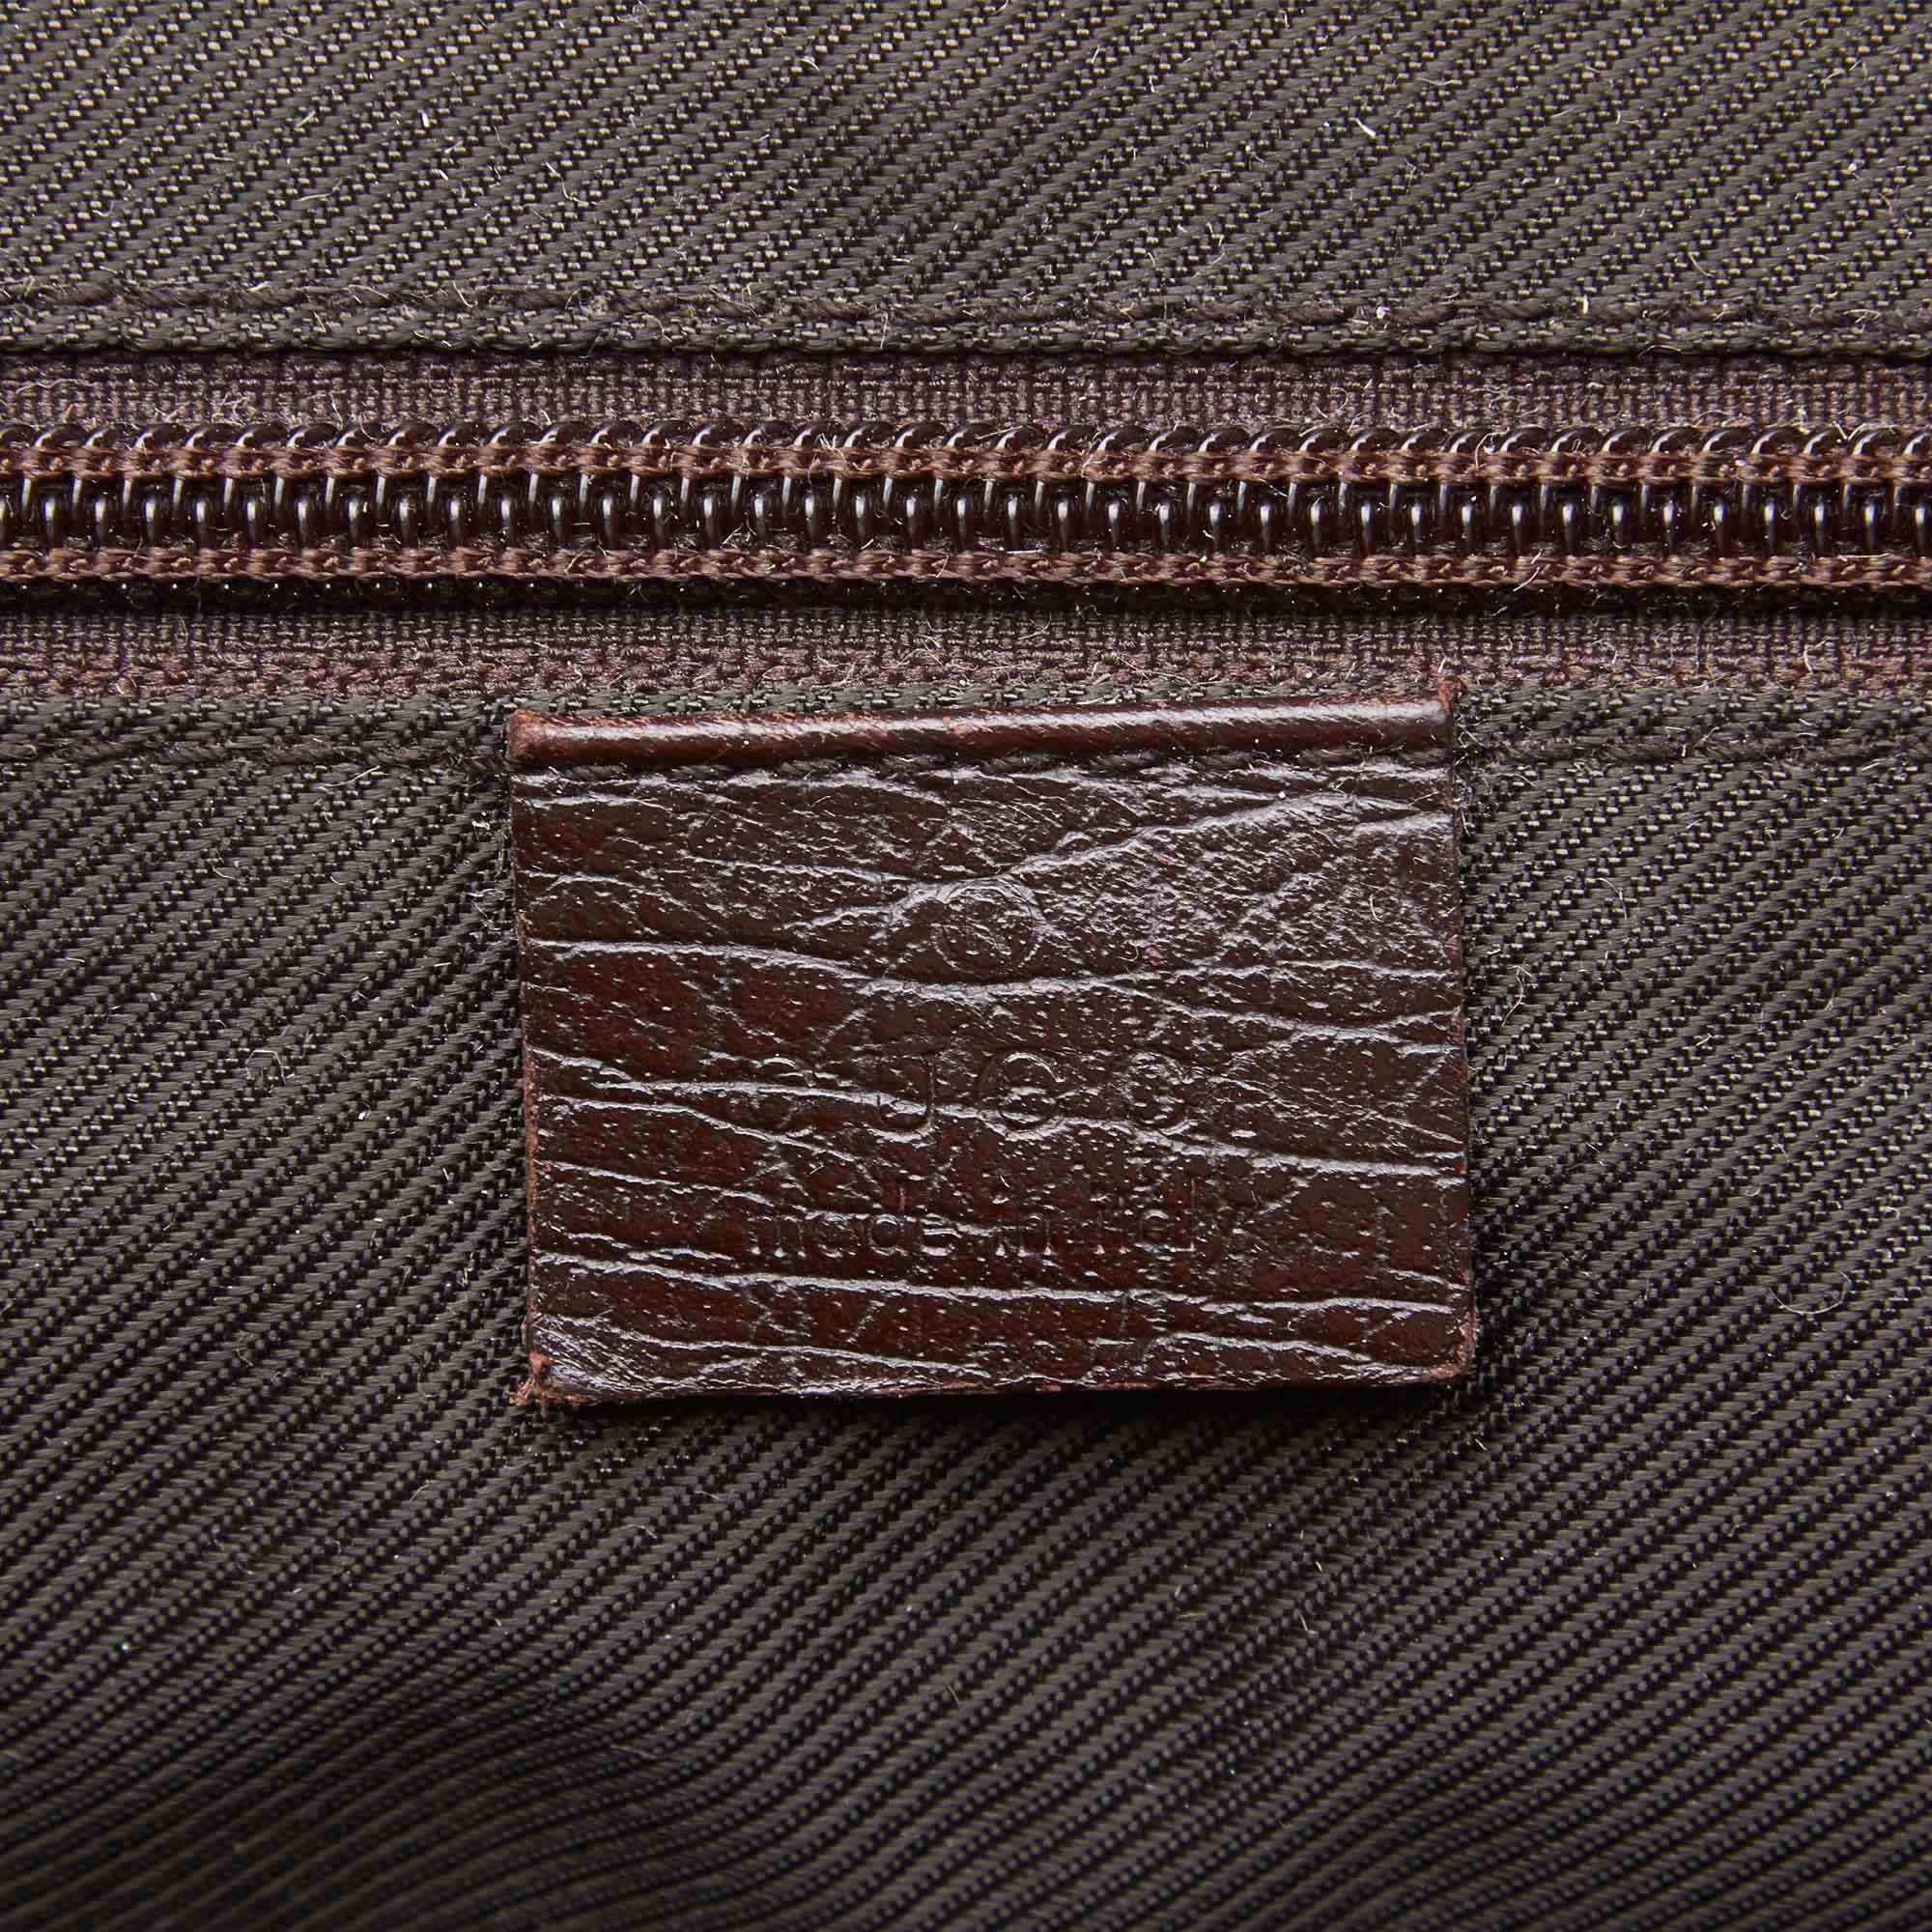 12b9272966e Gucci Brown x Beige Guccissima Canvas Crossbody Bag For Sale at 1stdibs